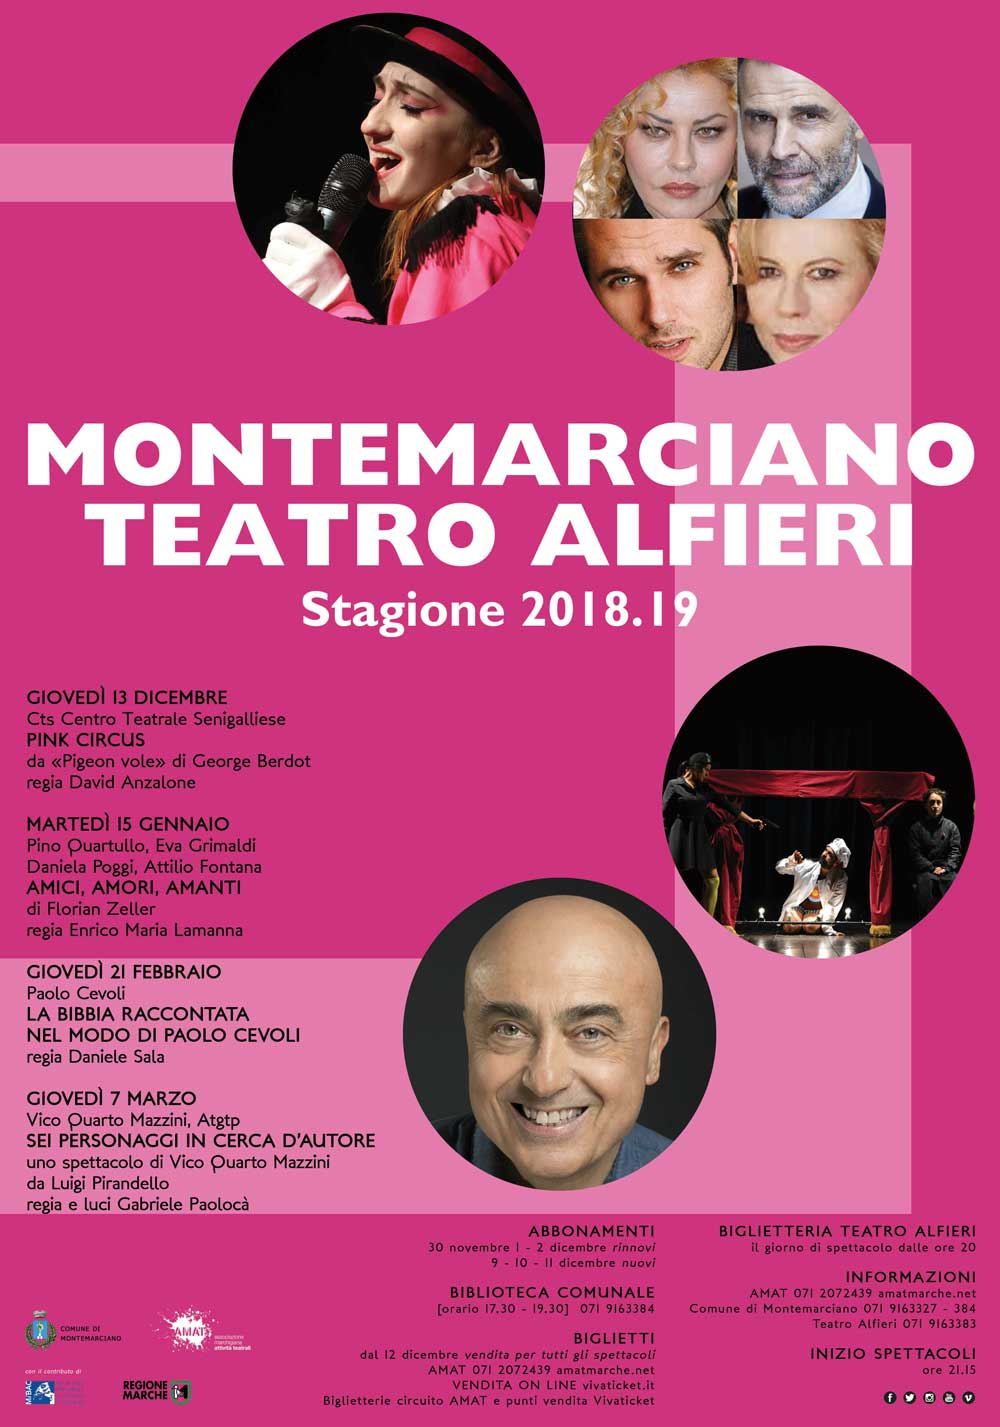 Montemarciano 2018/19